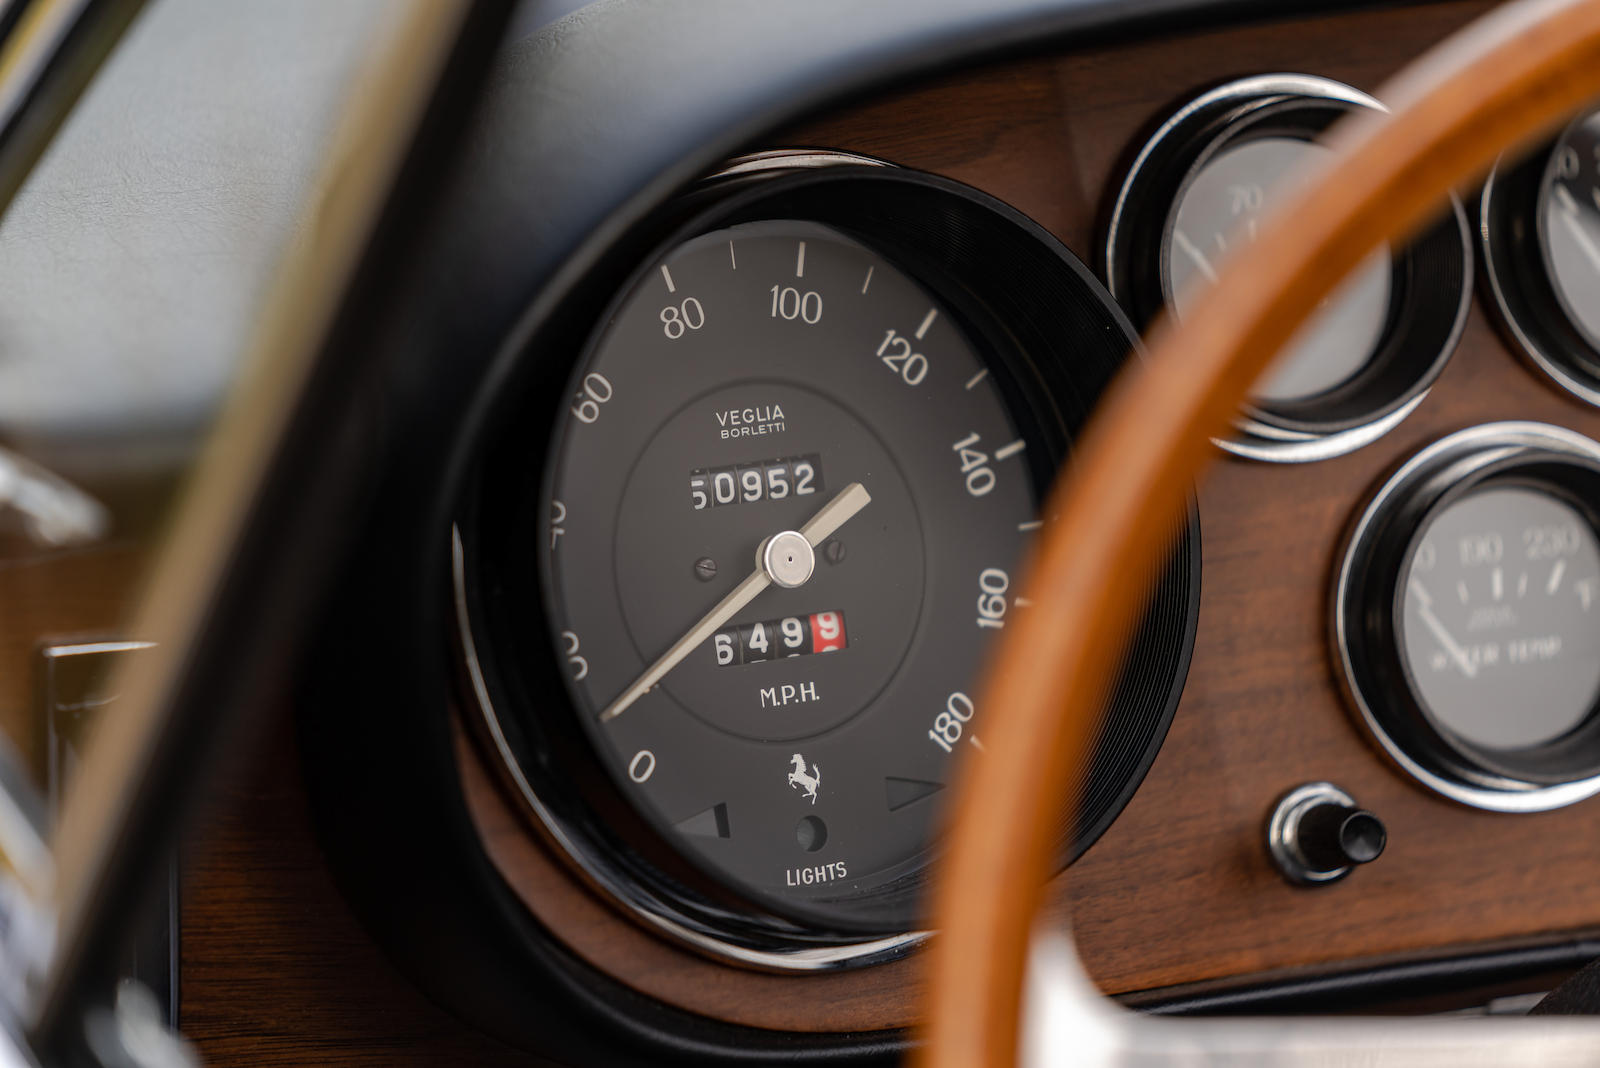 Ferrari 330 GTC Odometer